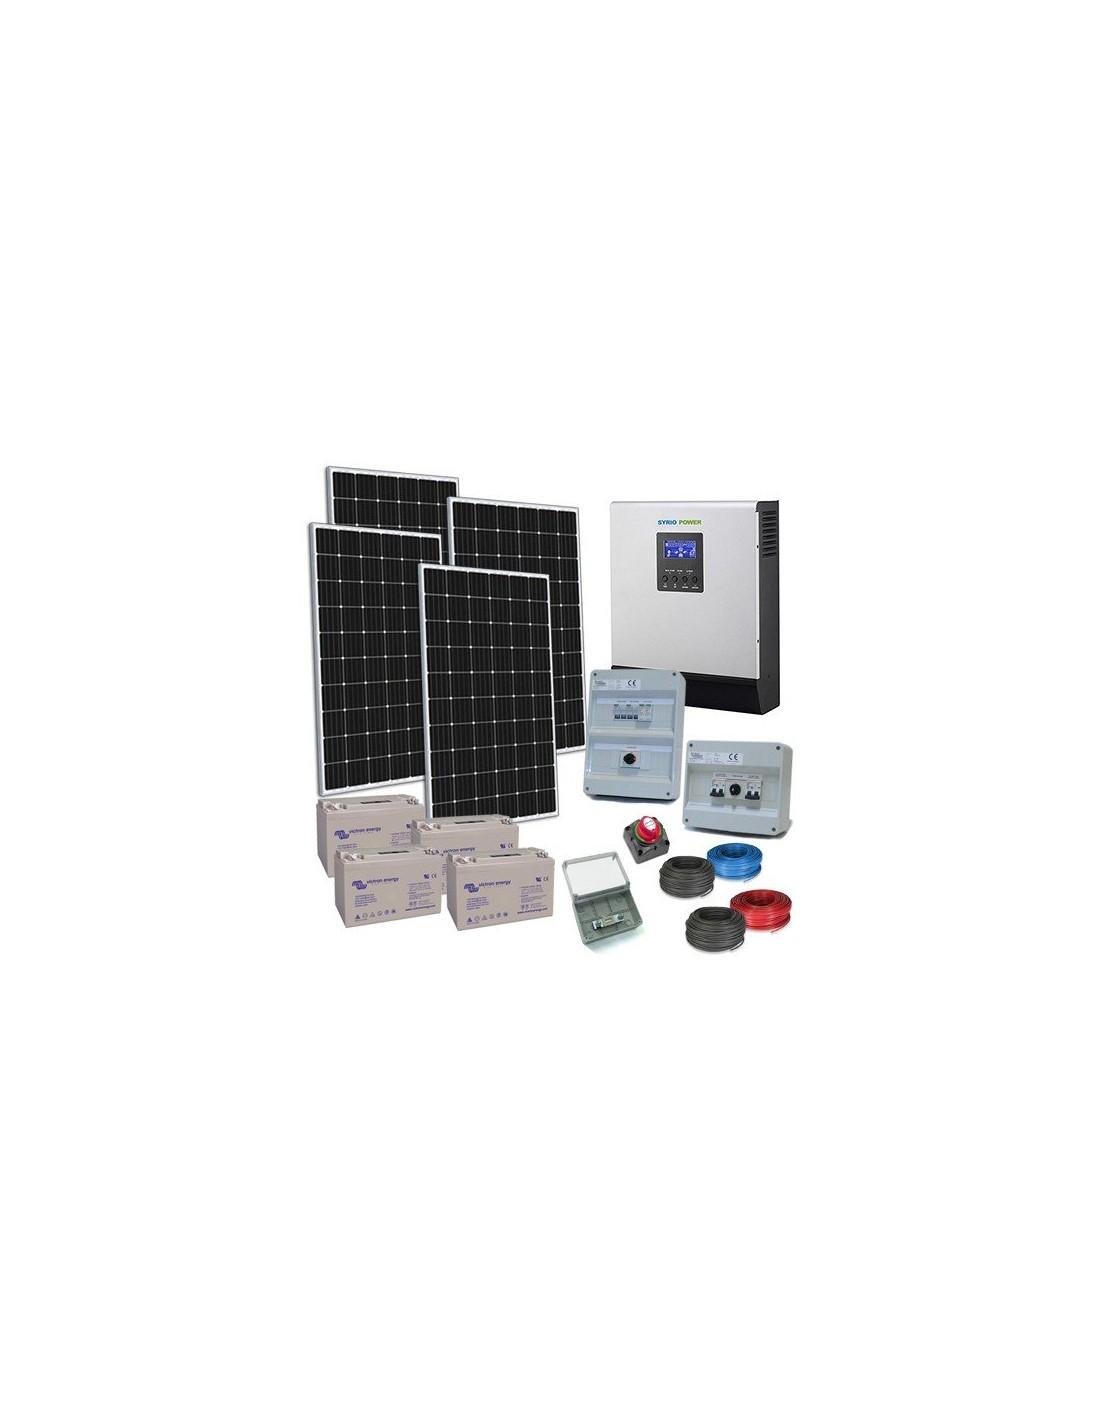 kit solarhaus tr plus 48v wechselrichter 5000w. Black Bedroom Furniture Sets. Home Design Ideas